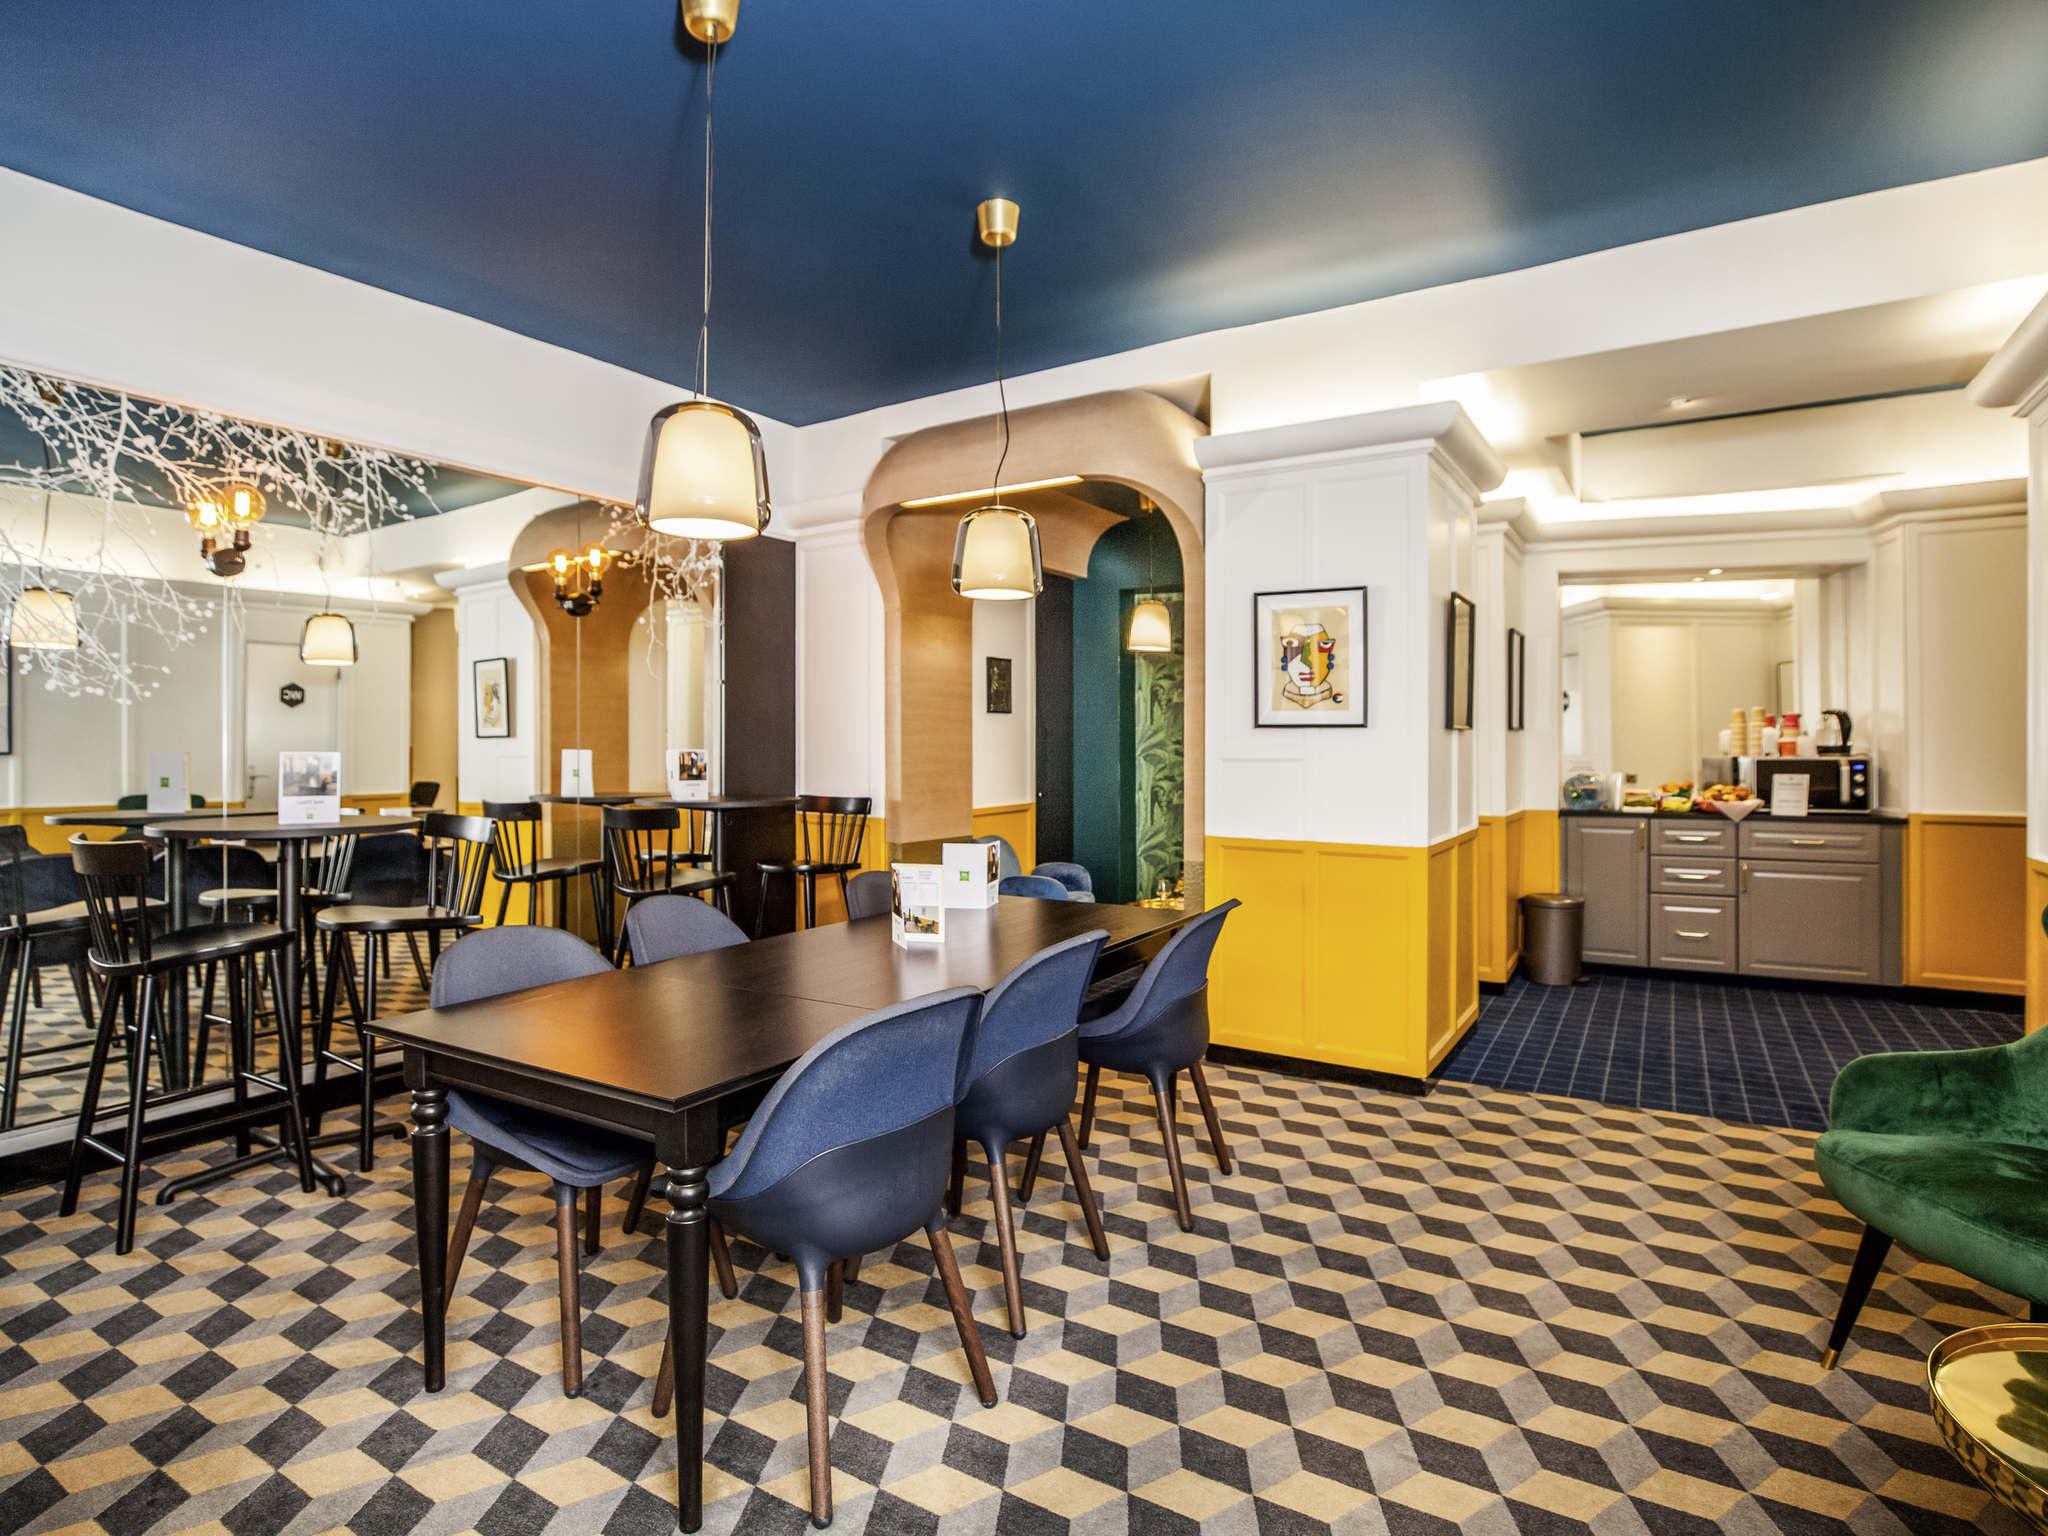 فندق - إيبيس ستايلز ibis Styles باريس كادي لافاييت